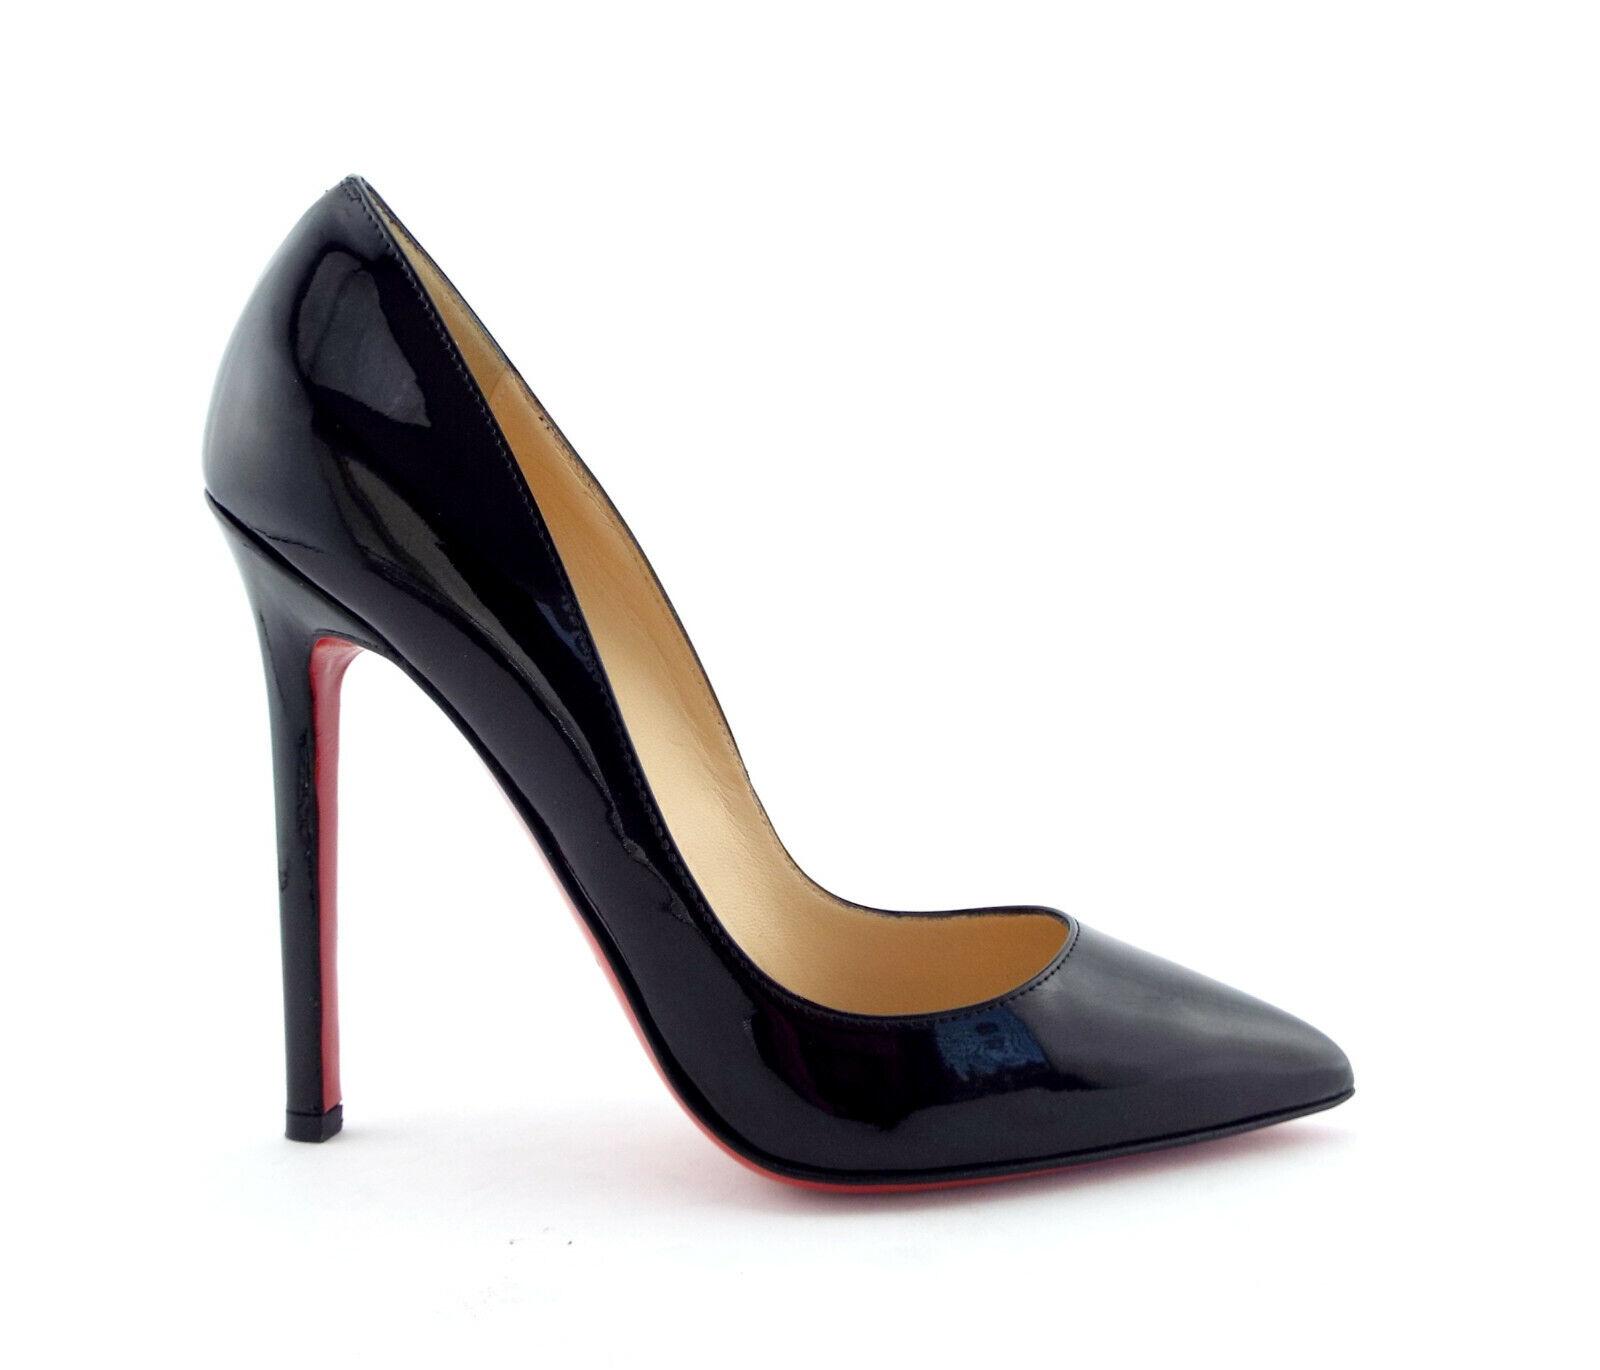 New CHRISTIAN LOUBOUTIN Size 5 PIGALLE Black Patent Heels Pumps Shoes 35